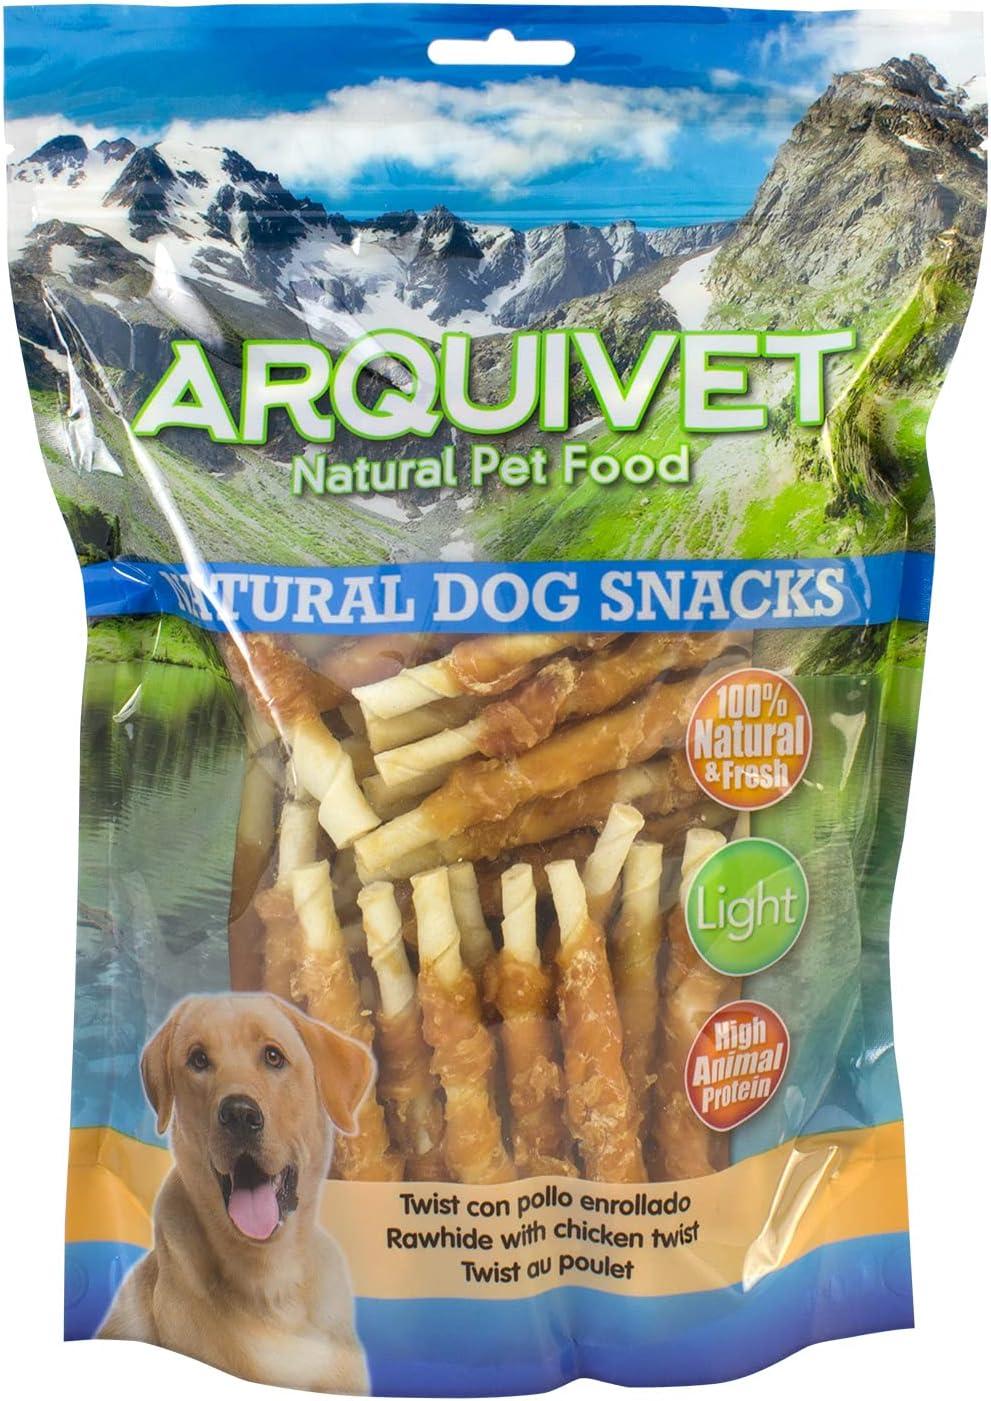 Arquivet Twist con pollo enrollado - Snacks Naturales para perros - Chuches para perros - Golosinas para perro - Premios para tu mascota - 13 cm - 1 ...